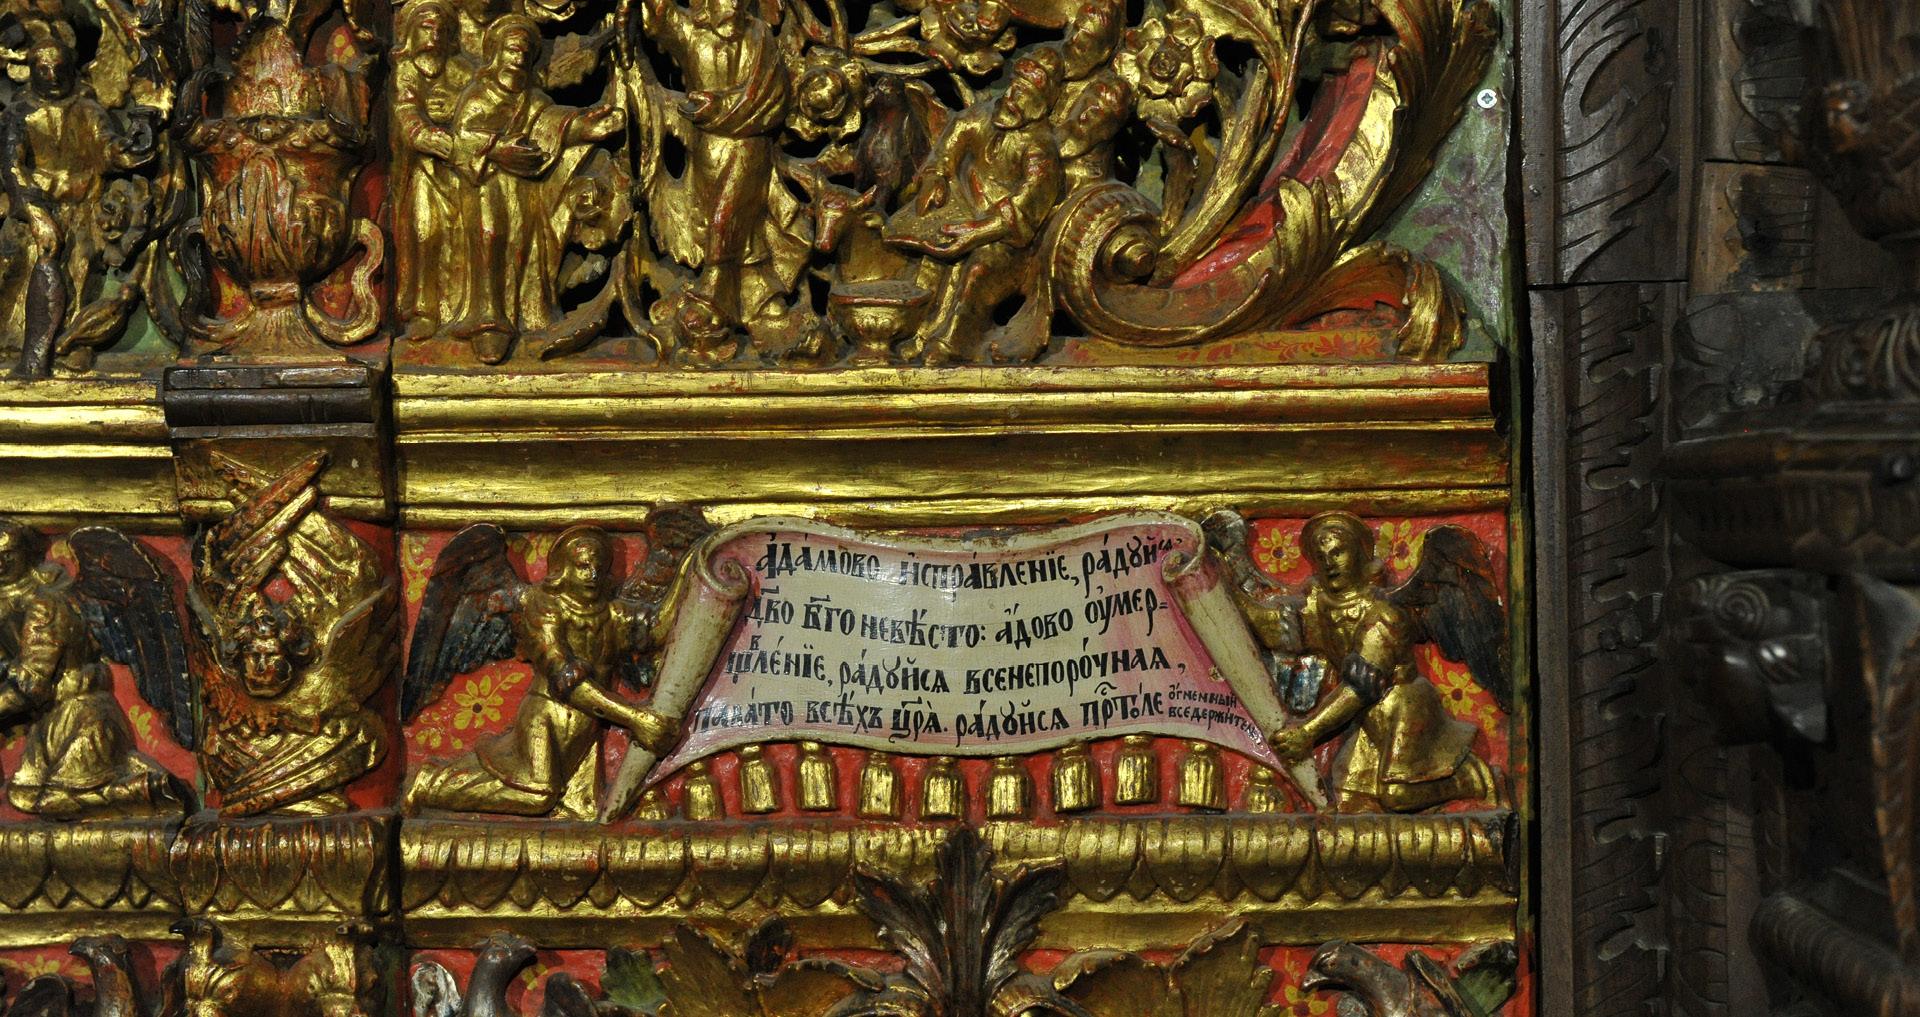 Стихови од Благодарствениот канон кон Богородица